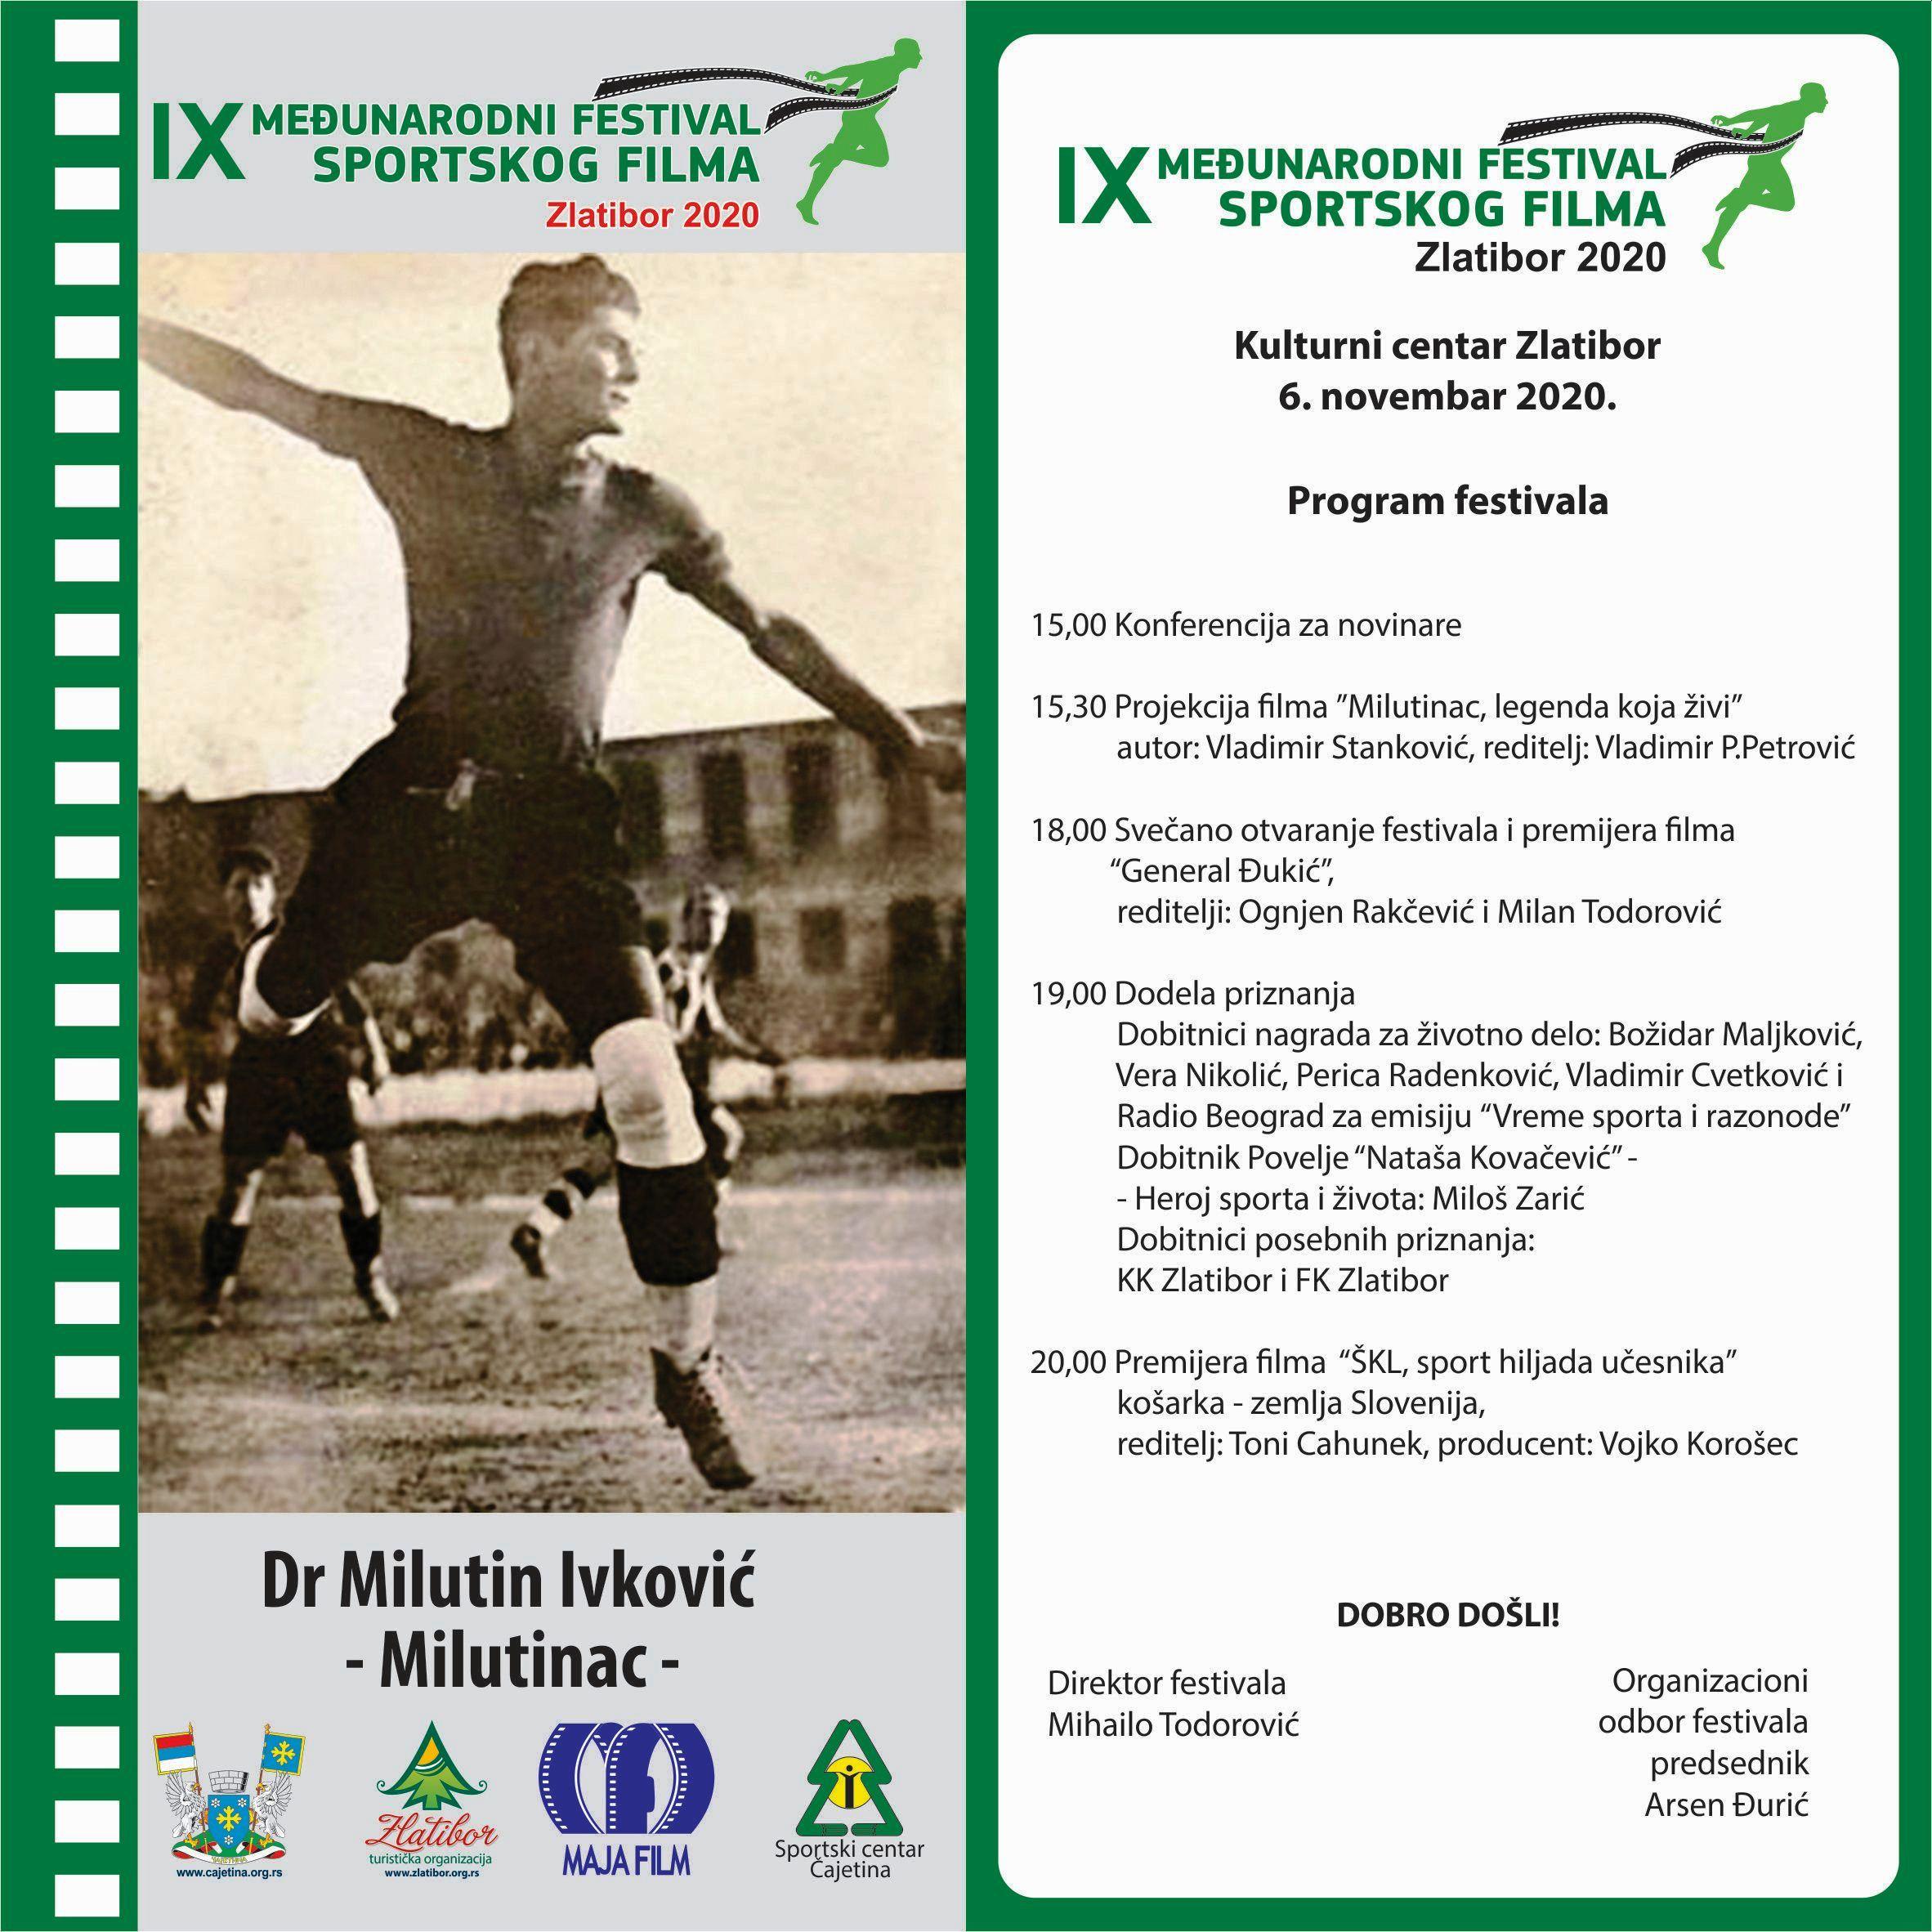 Program-festivala-2020 IX Međunarodni festival sportskog filma Zlatibor